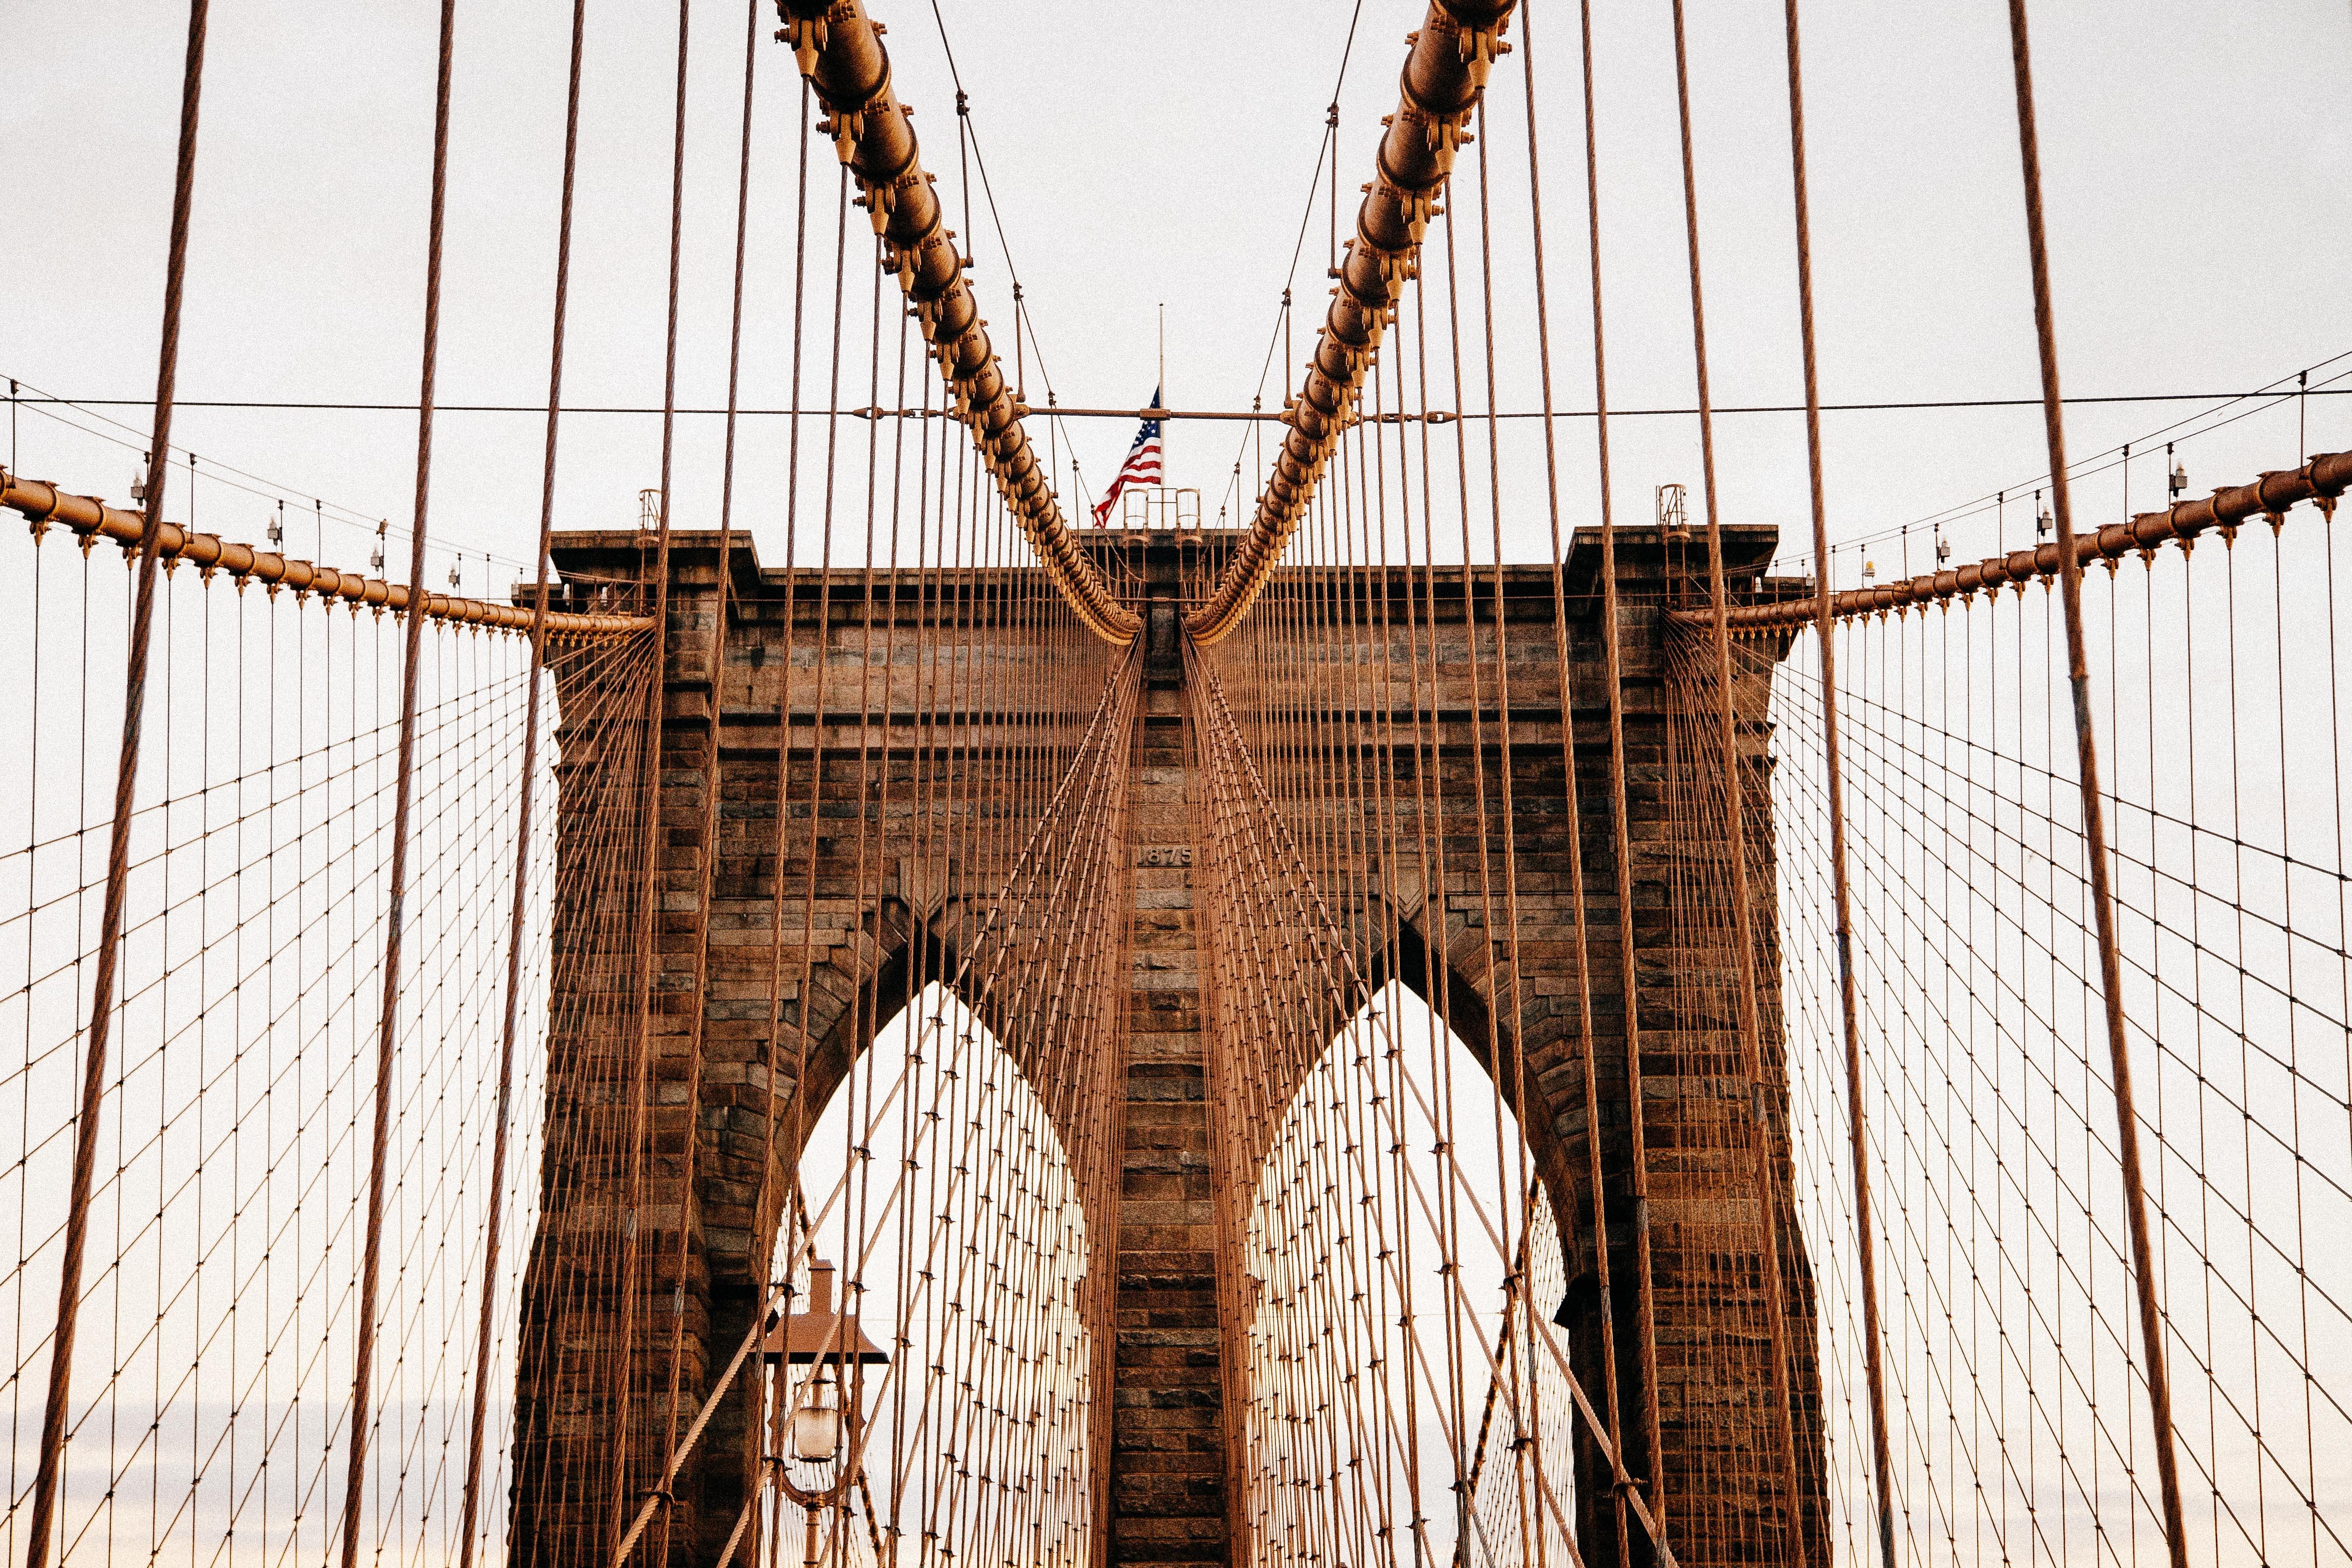 Bridge in America, America, Bridge, Construction, Support, HQ Photo